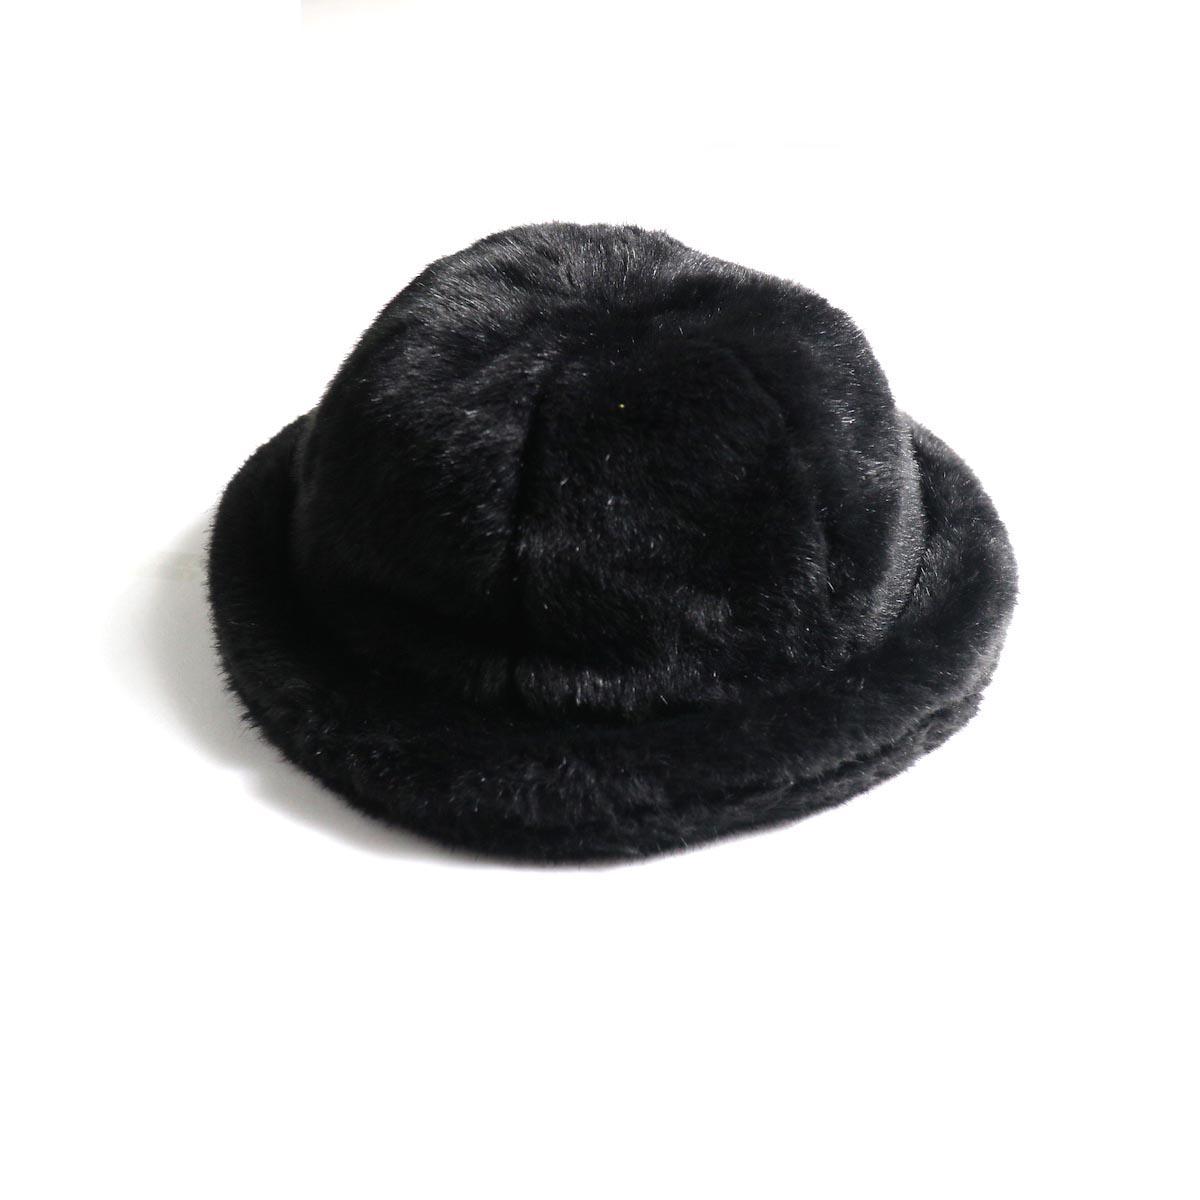 KIJIMA TAKAYUKI / Fake Fur 6 Panel Hat (No.182926) black 正面